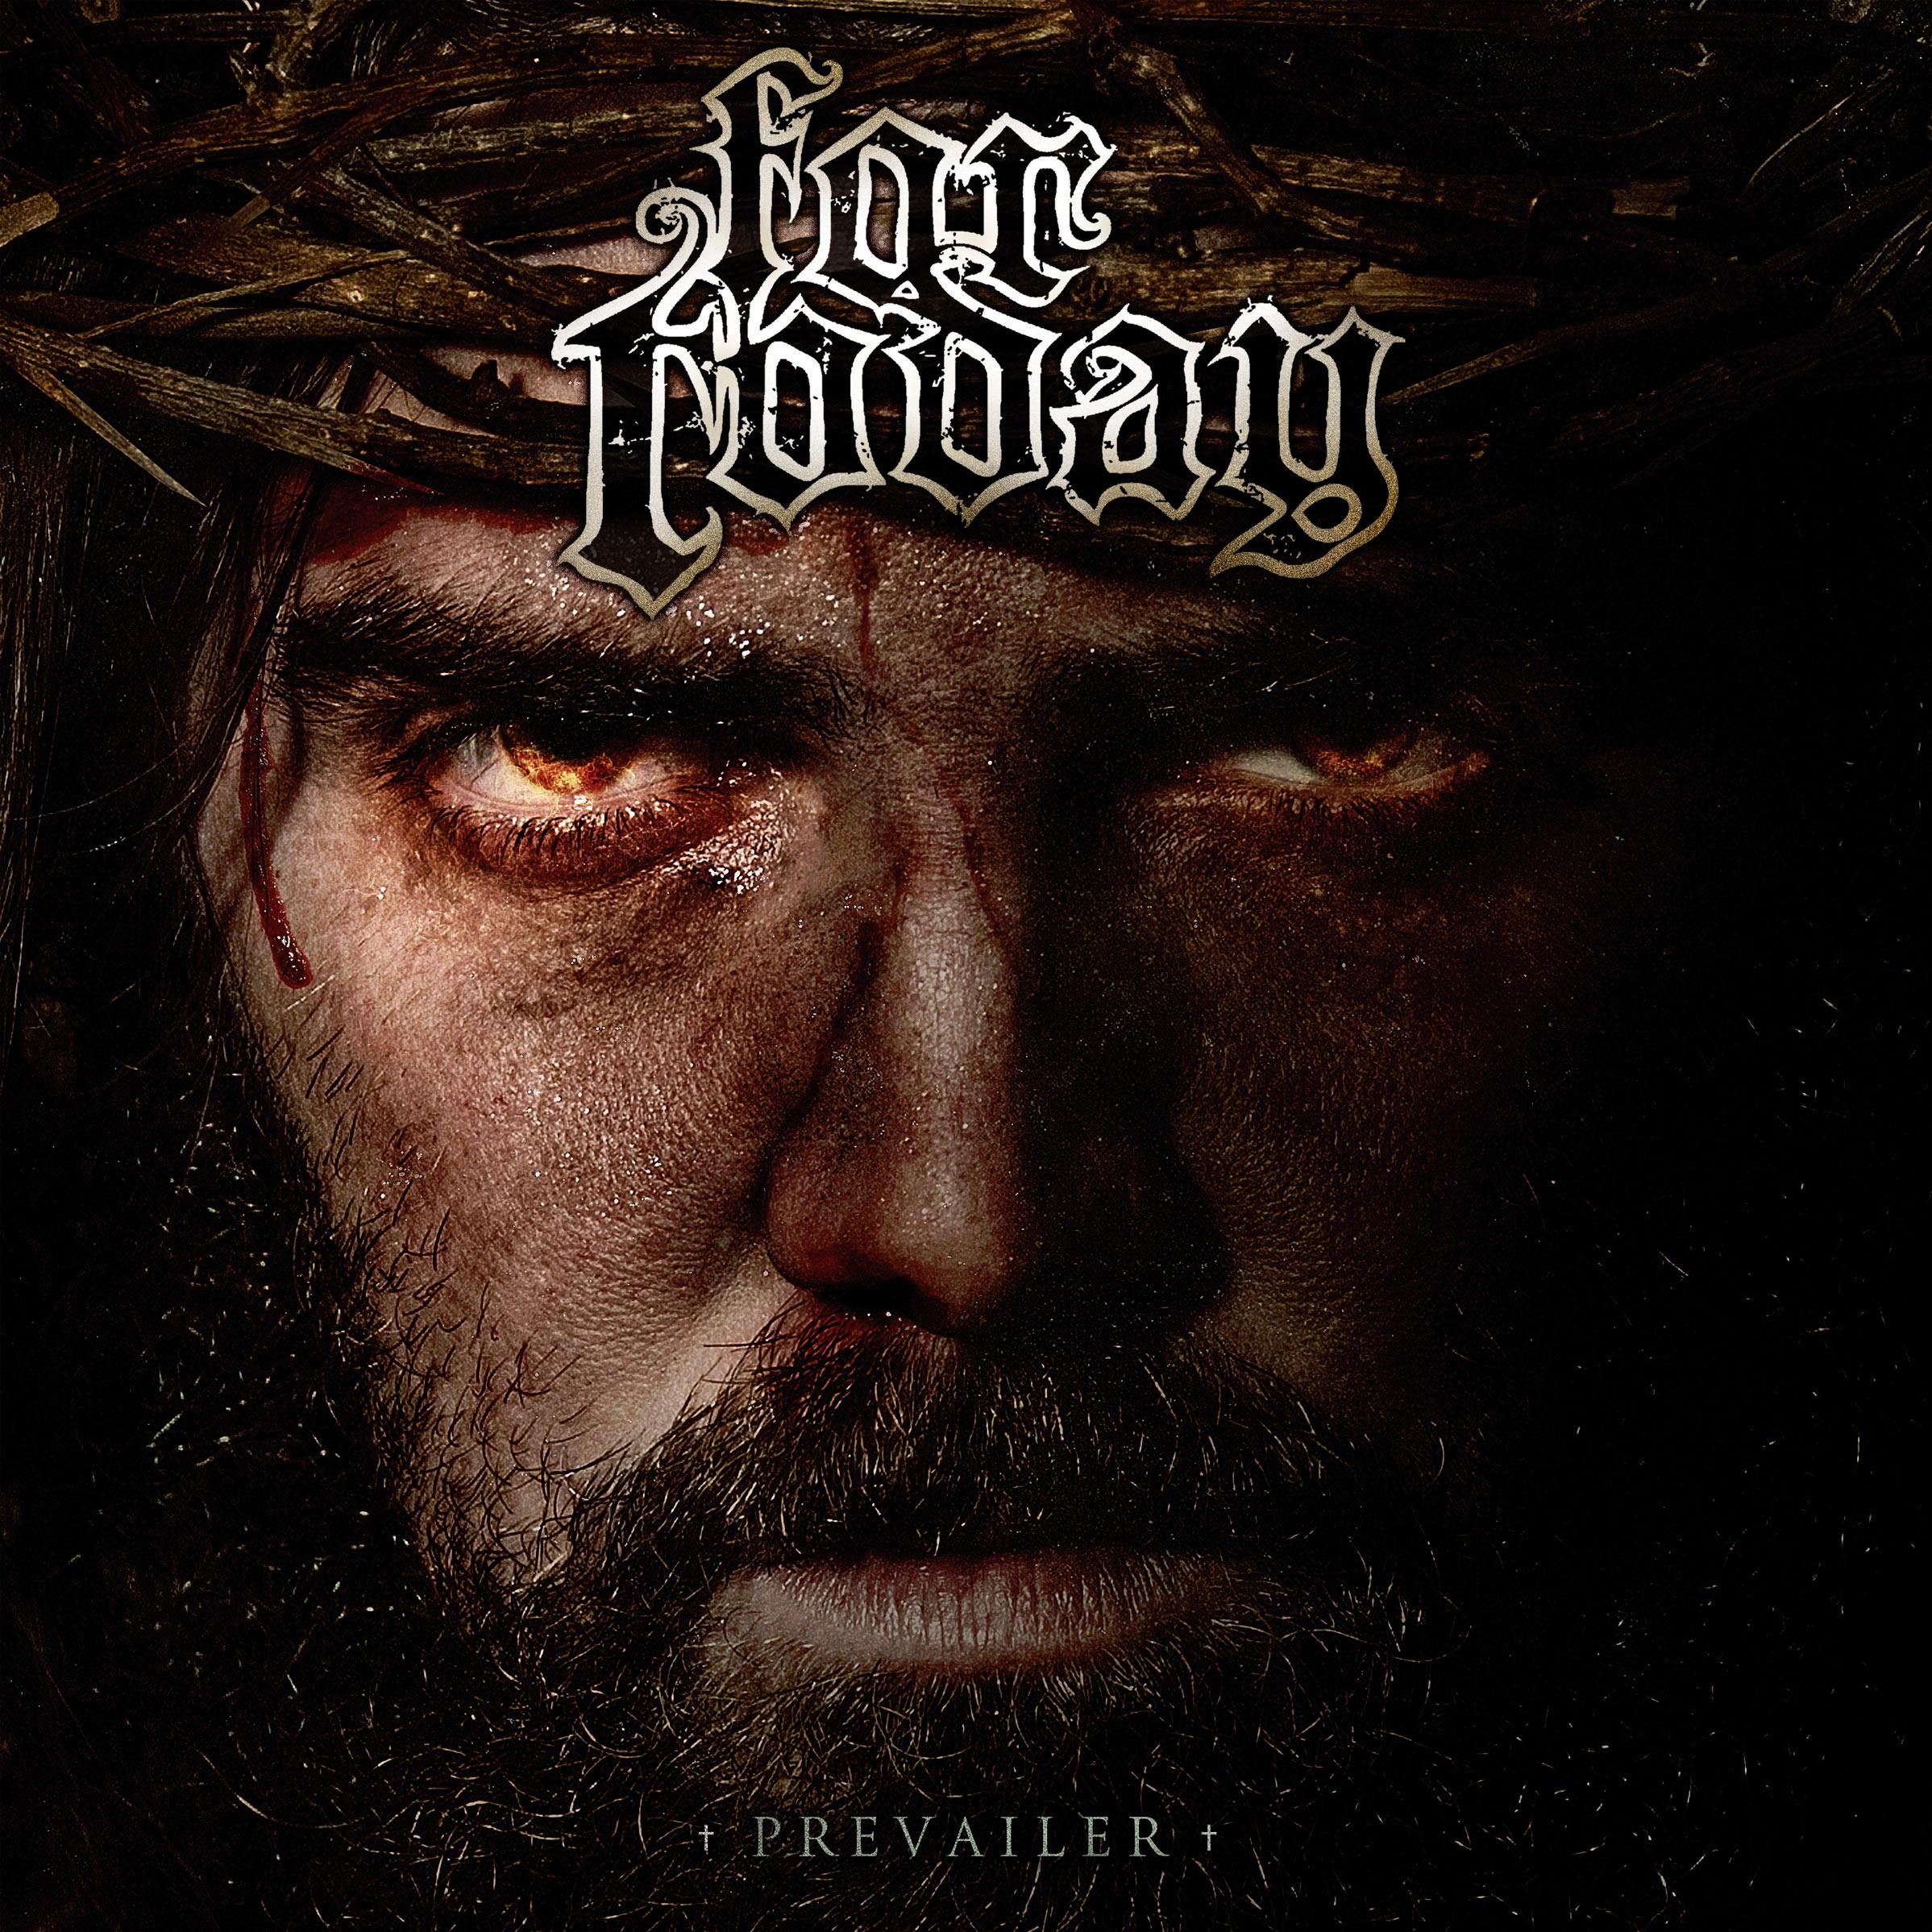 Jesusfreakhideoutcom For Today Prevailer EP DVD Review 2397x2397